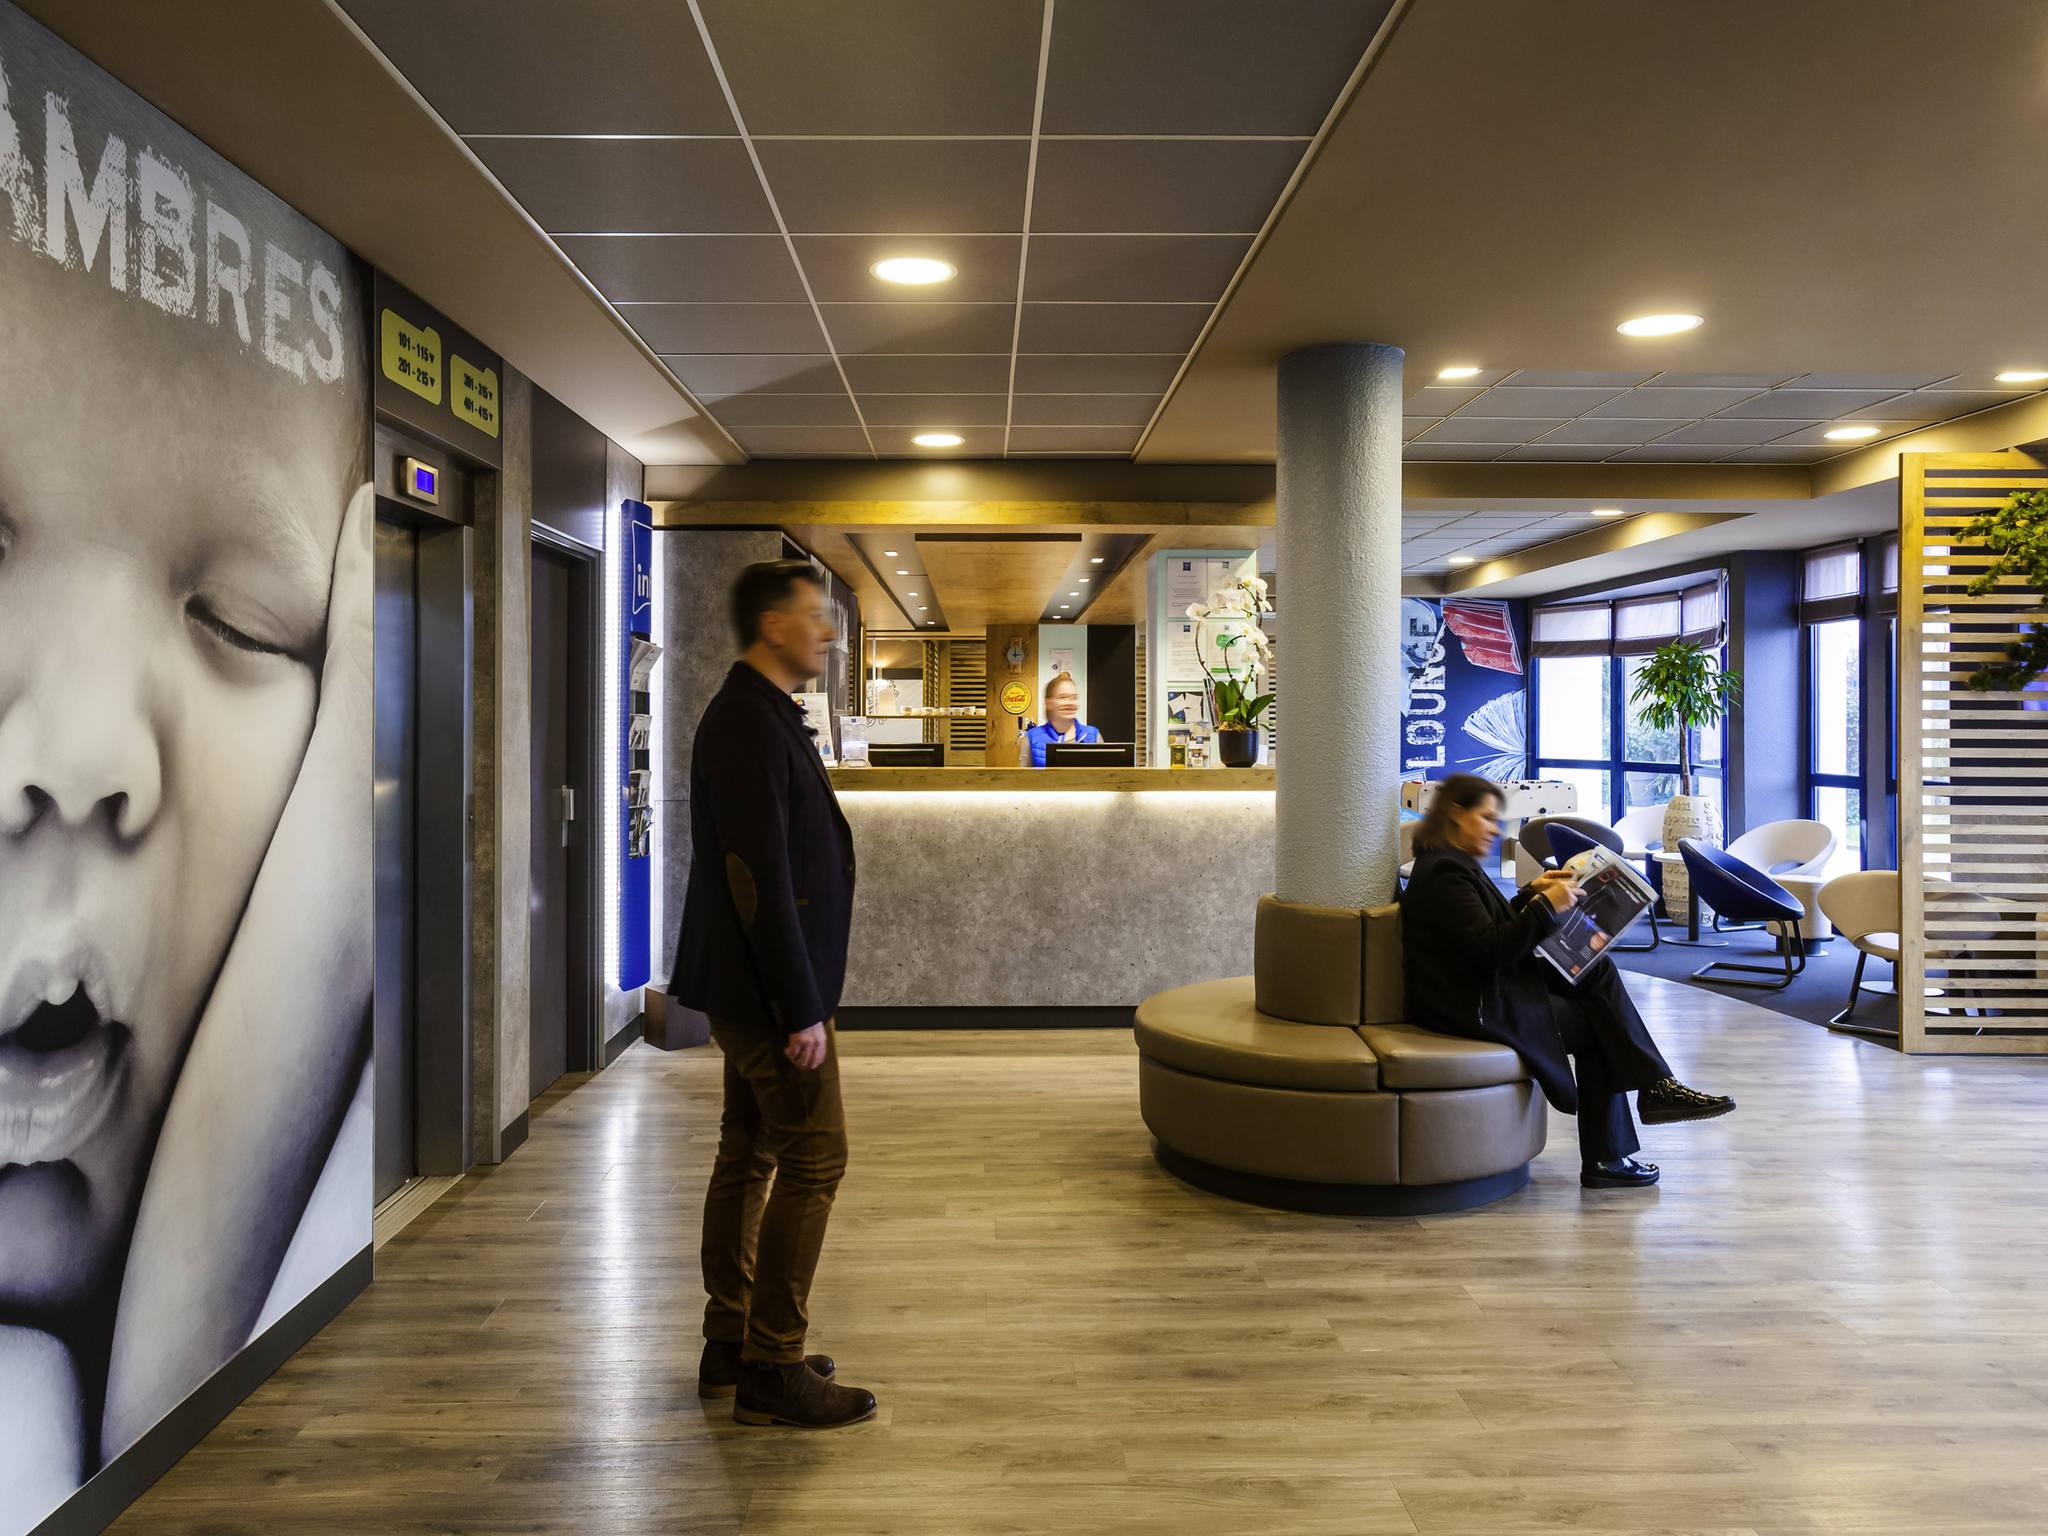 Hotell – ibis budget Marne-la-Vallée Pontault-Combault